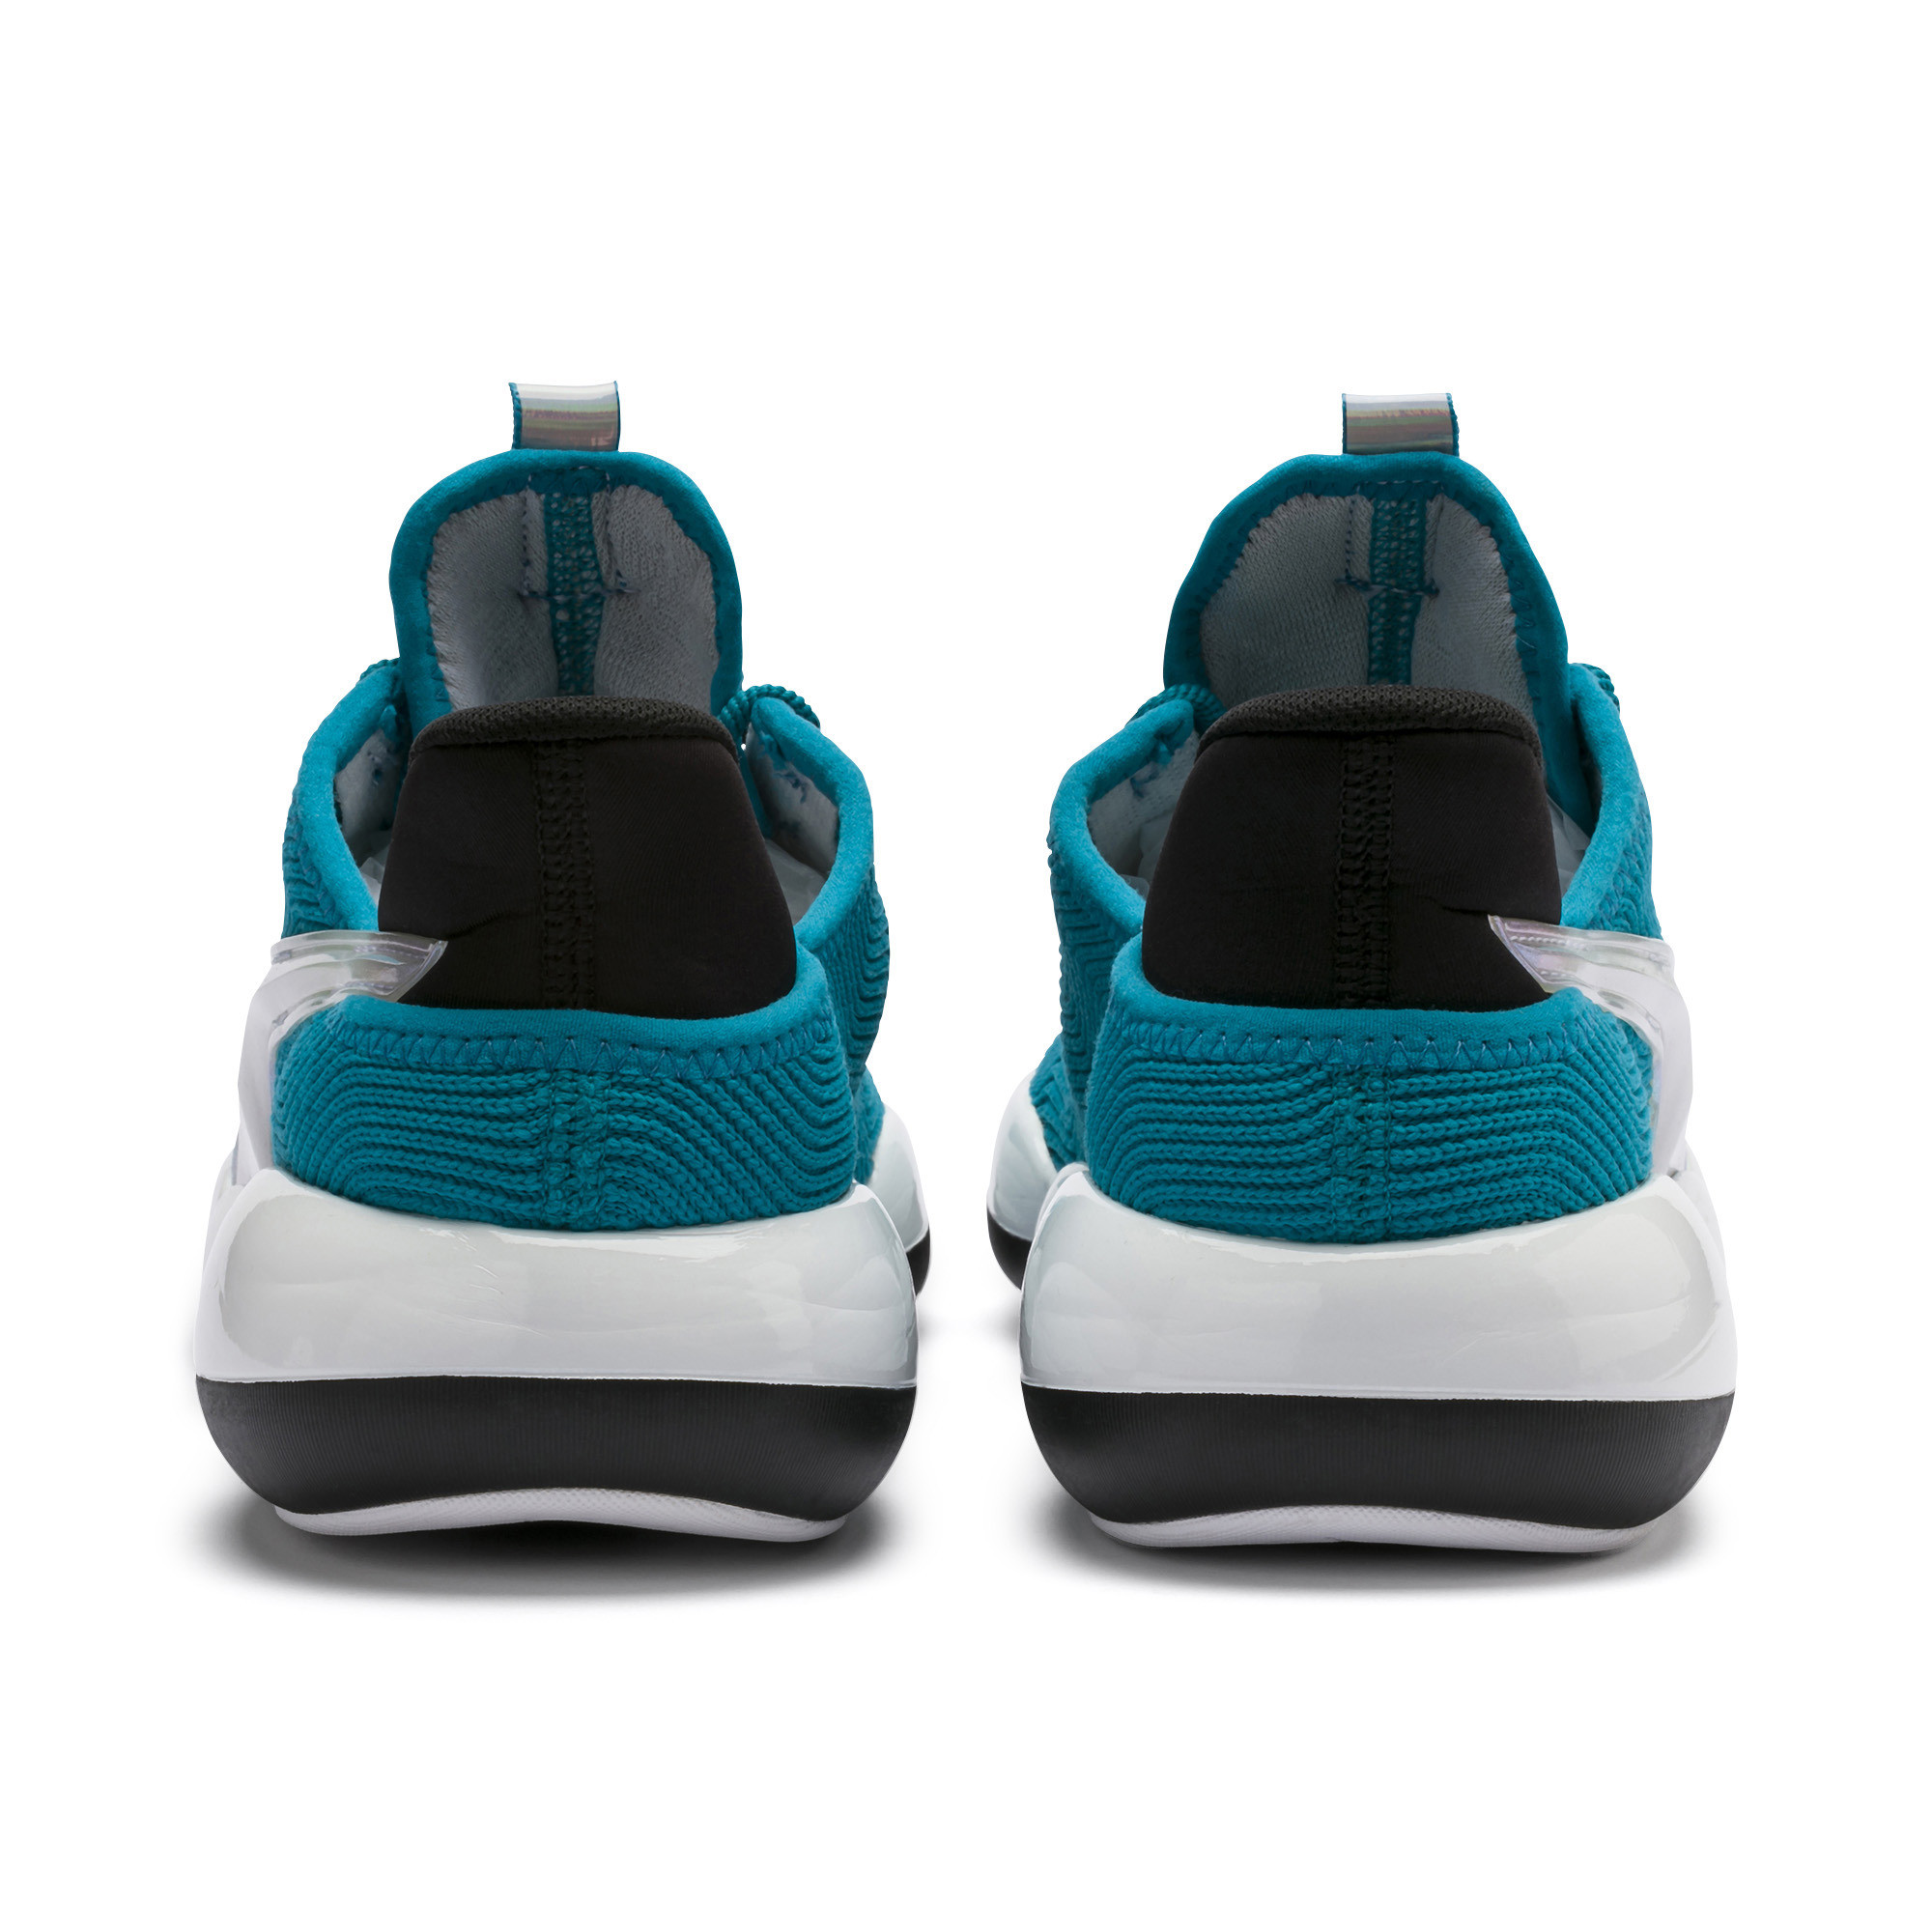 los angeles 16f00 cf8c7 Image Puma Mode XT Iridescent Trailblazer Women s Sneakers  4